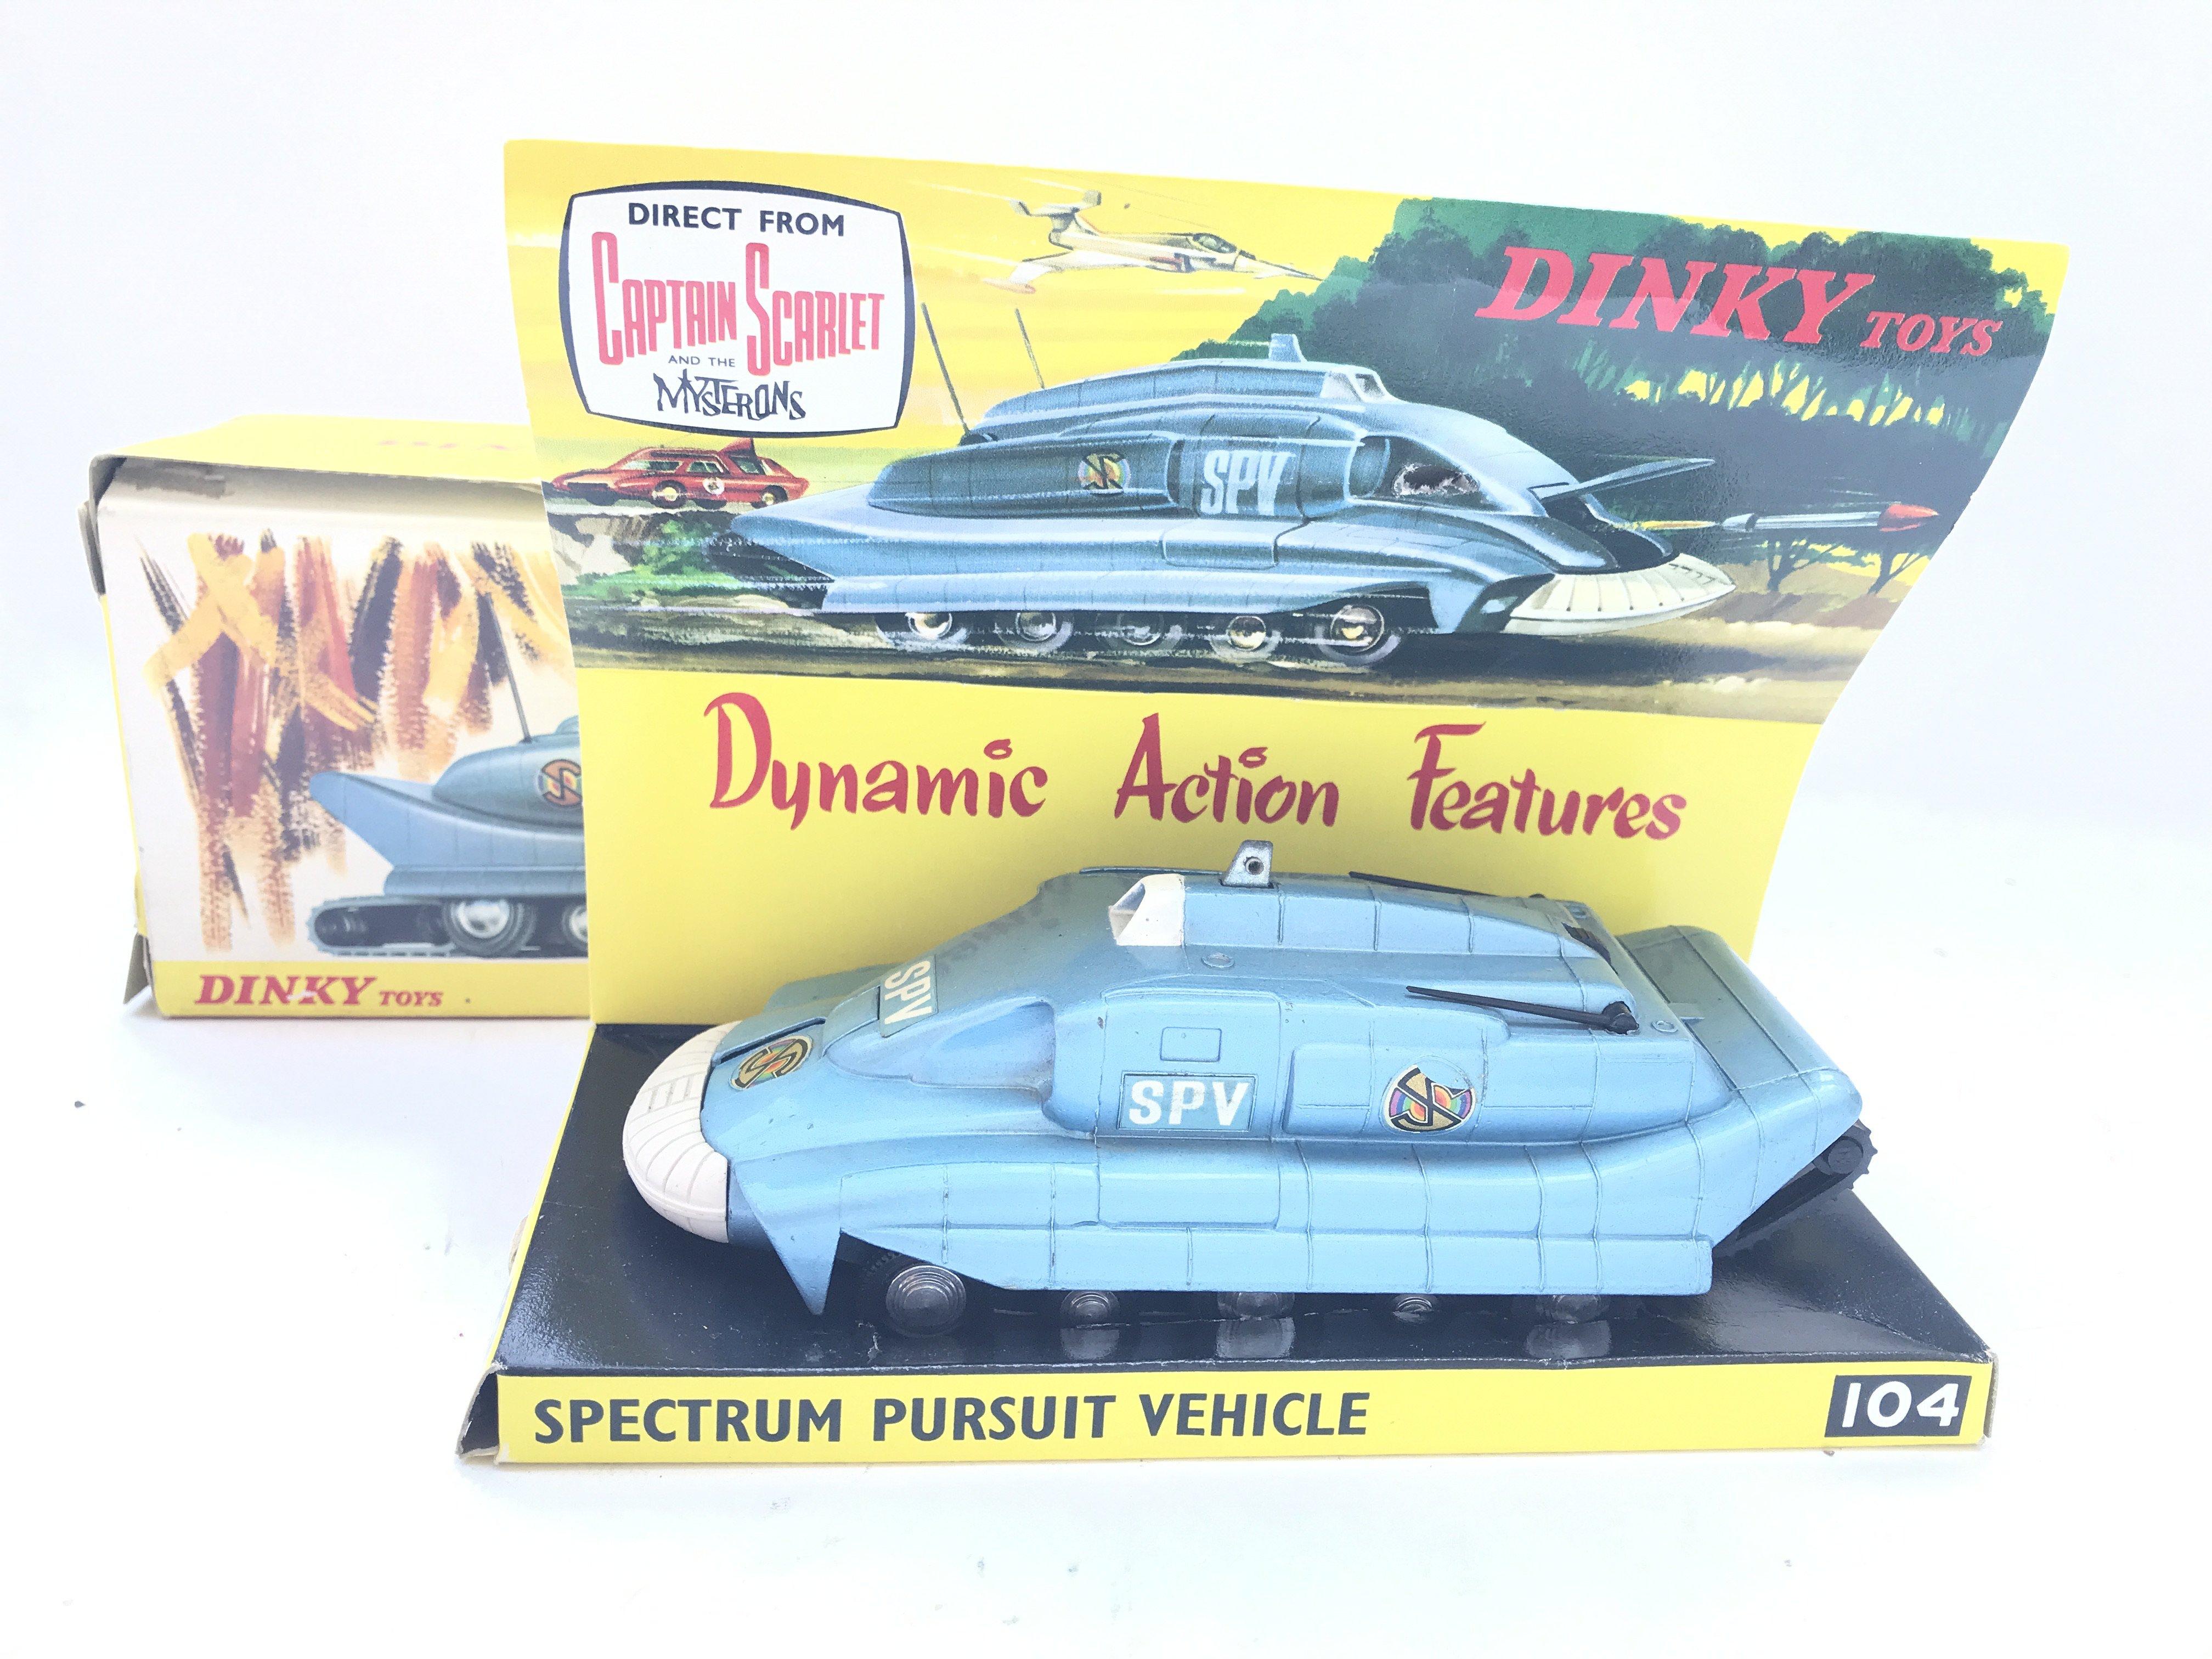 A Dinky Toys Spectrum Pursuit Vehicle Boxed. #104.